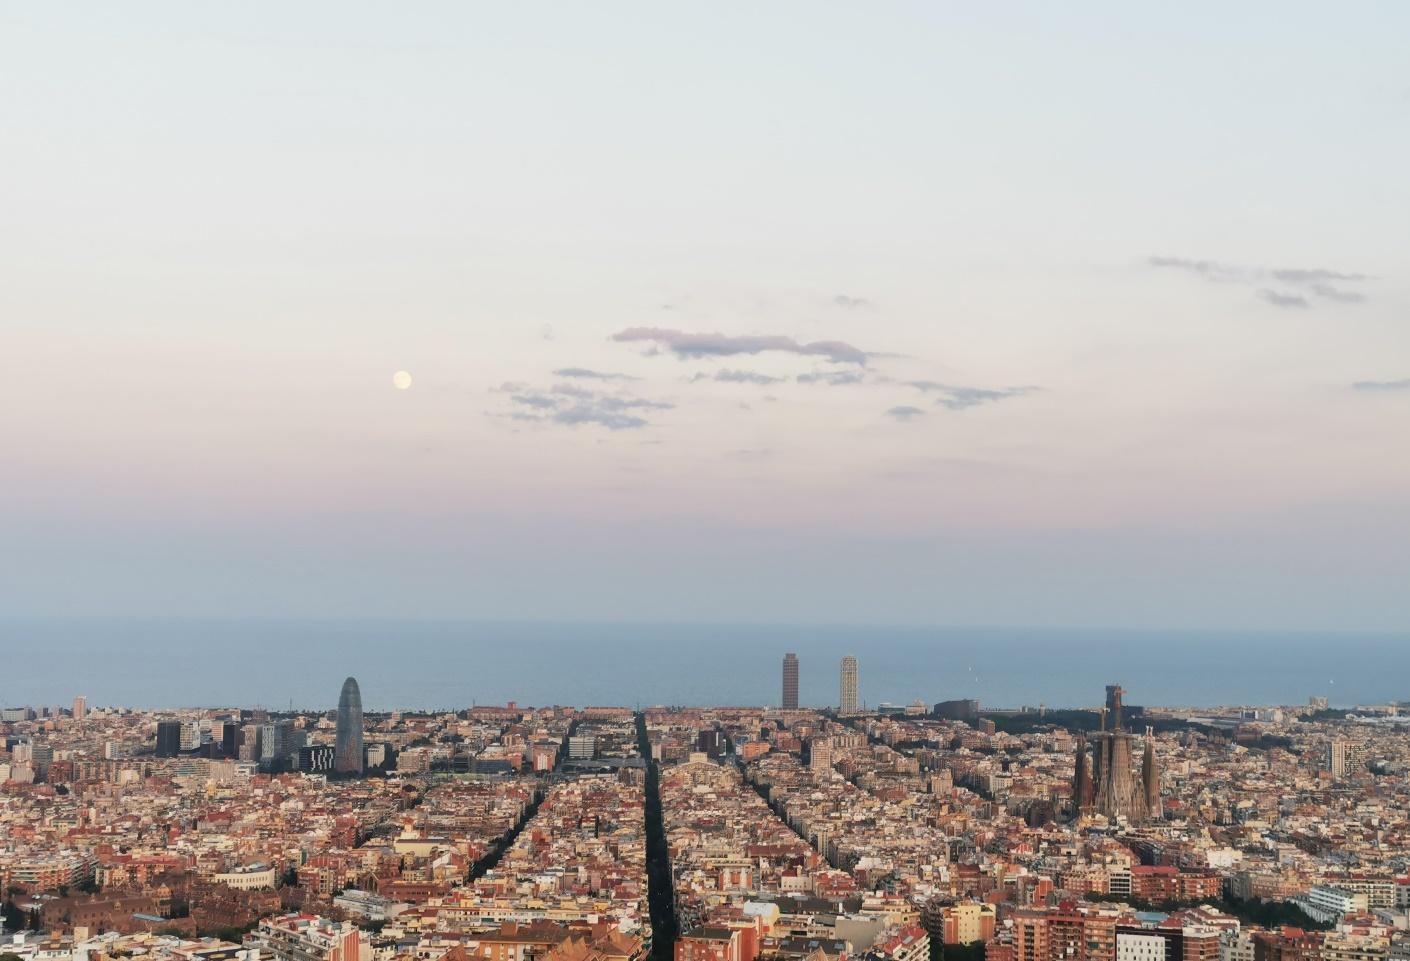 C:\Users\matus\Desktop\Barcelona FOTO\11 Bunkers del Carmel\IMG_20190715_211403uprav.jpg